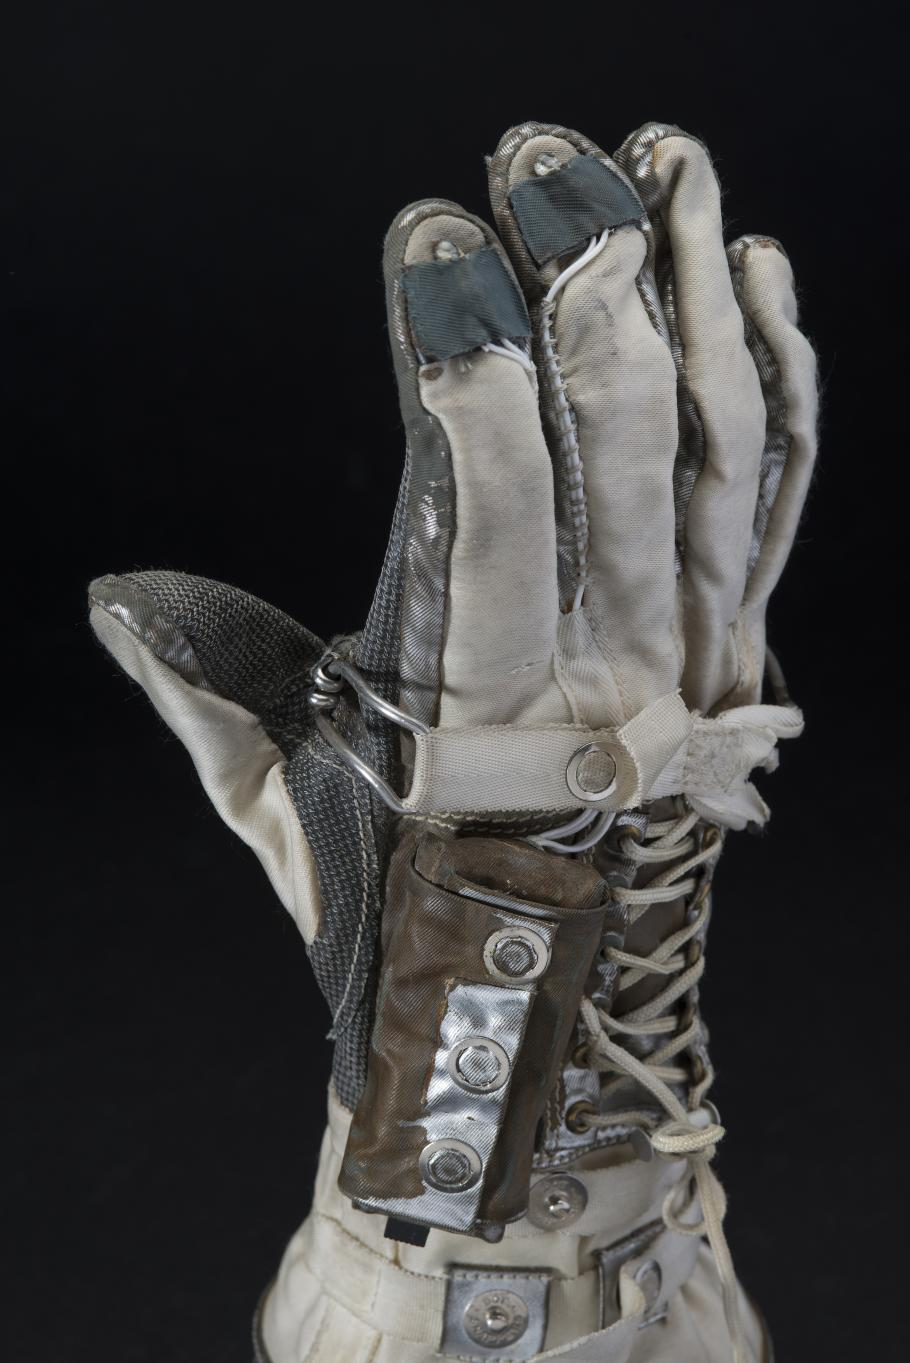 John Glenn Mercury Friendship 7 Right Glove